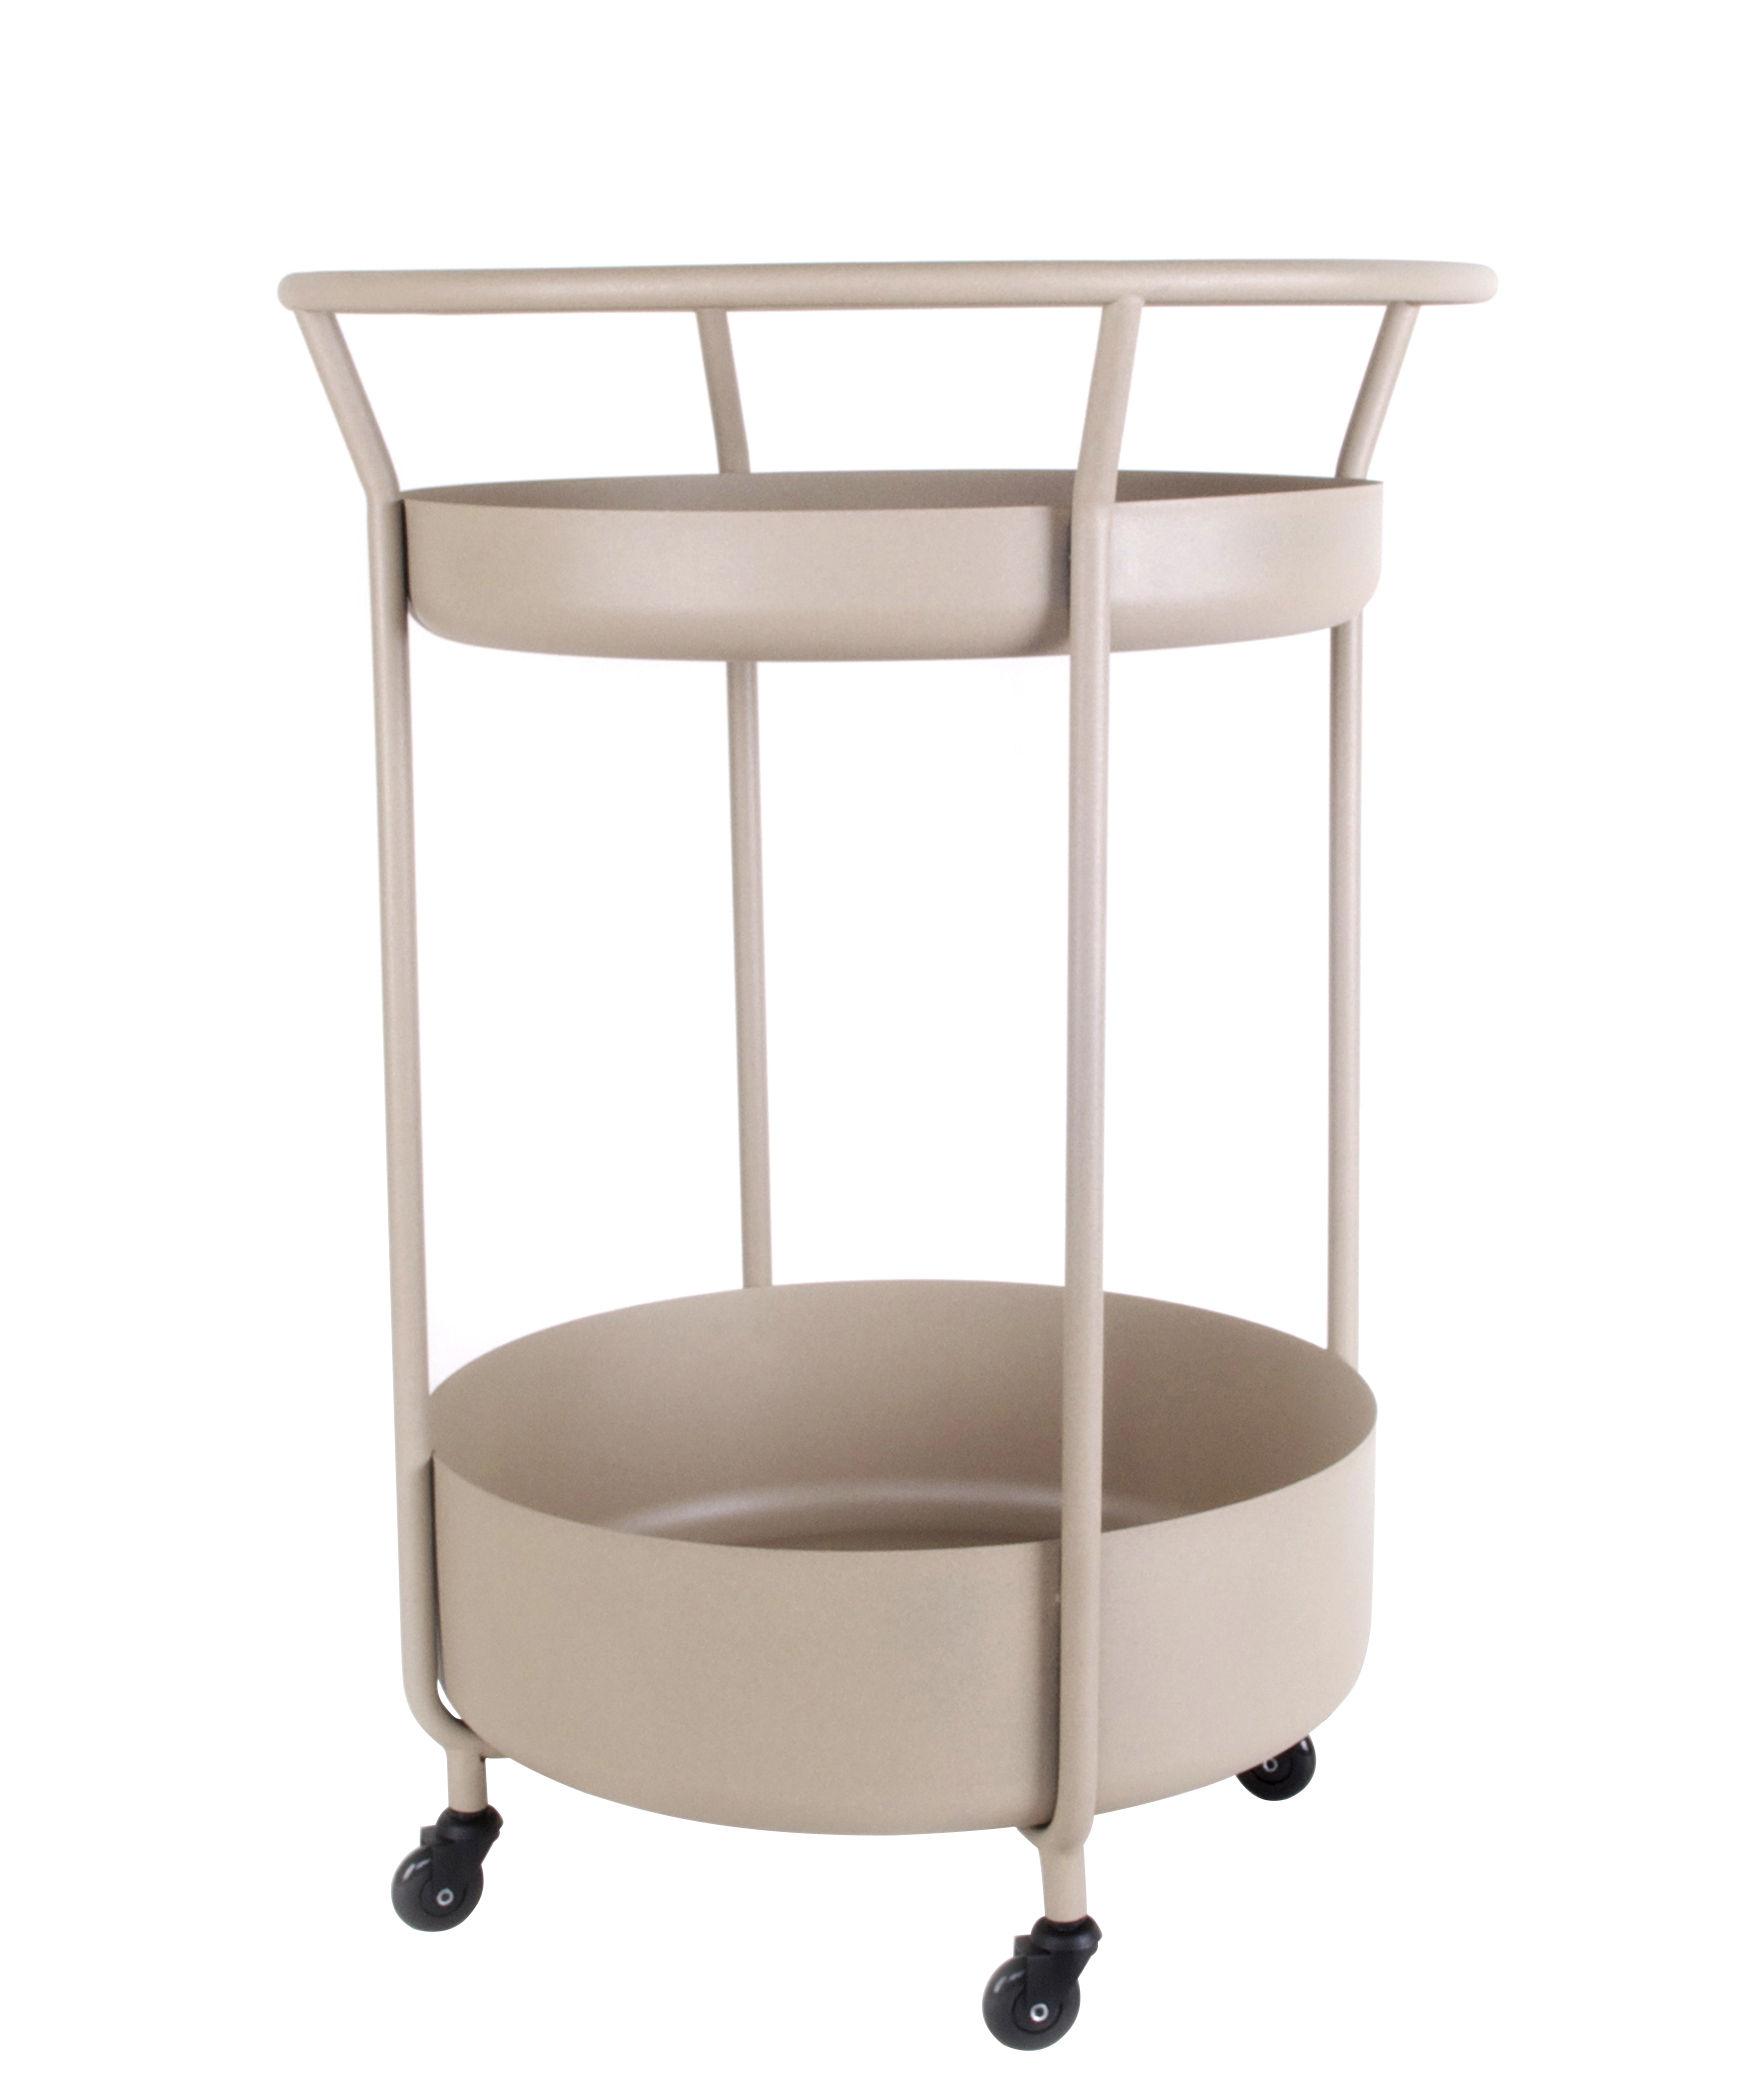 Möbel - Beistell-Möbel - Corona Ablage / Stahl - XL Boom - Quarzgrau - Acier laqué époxy